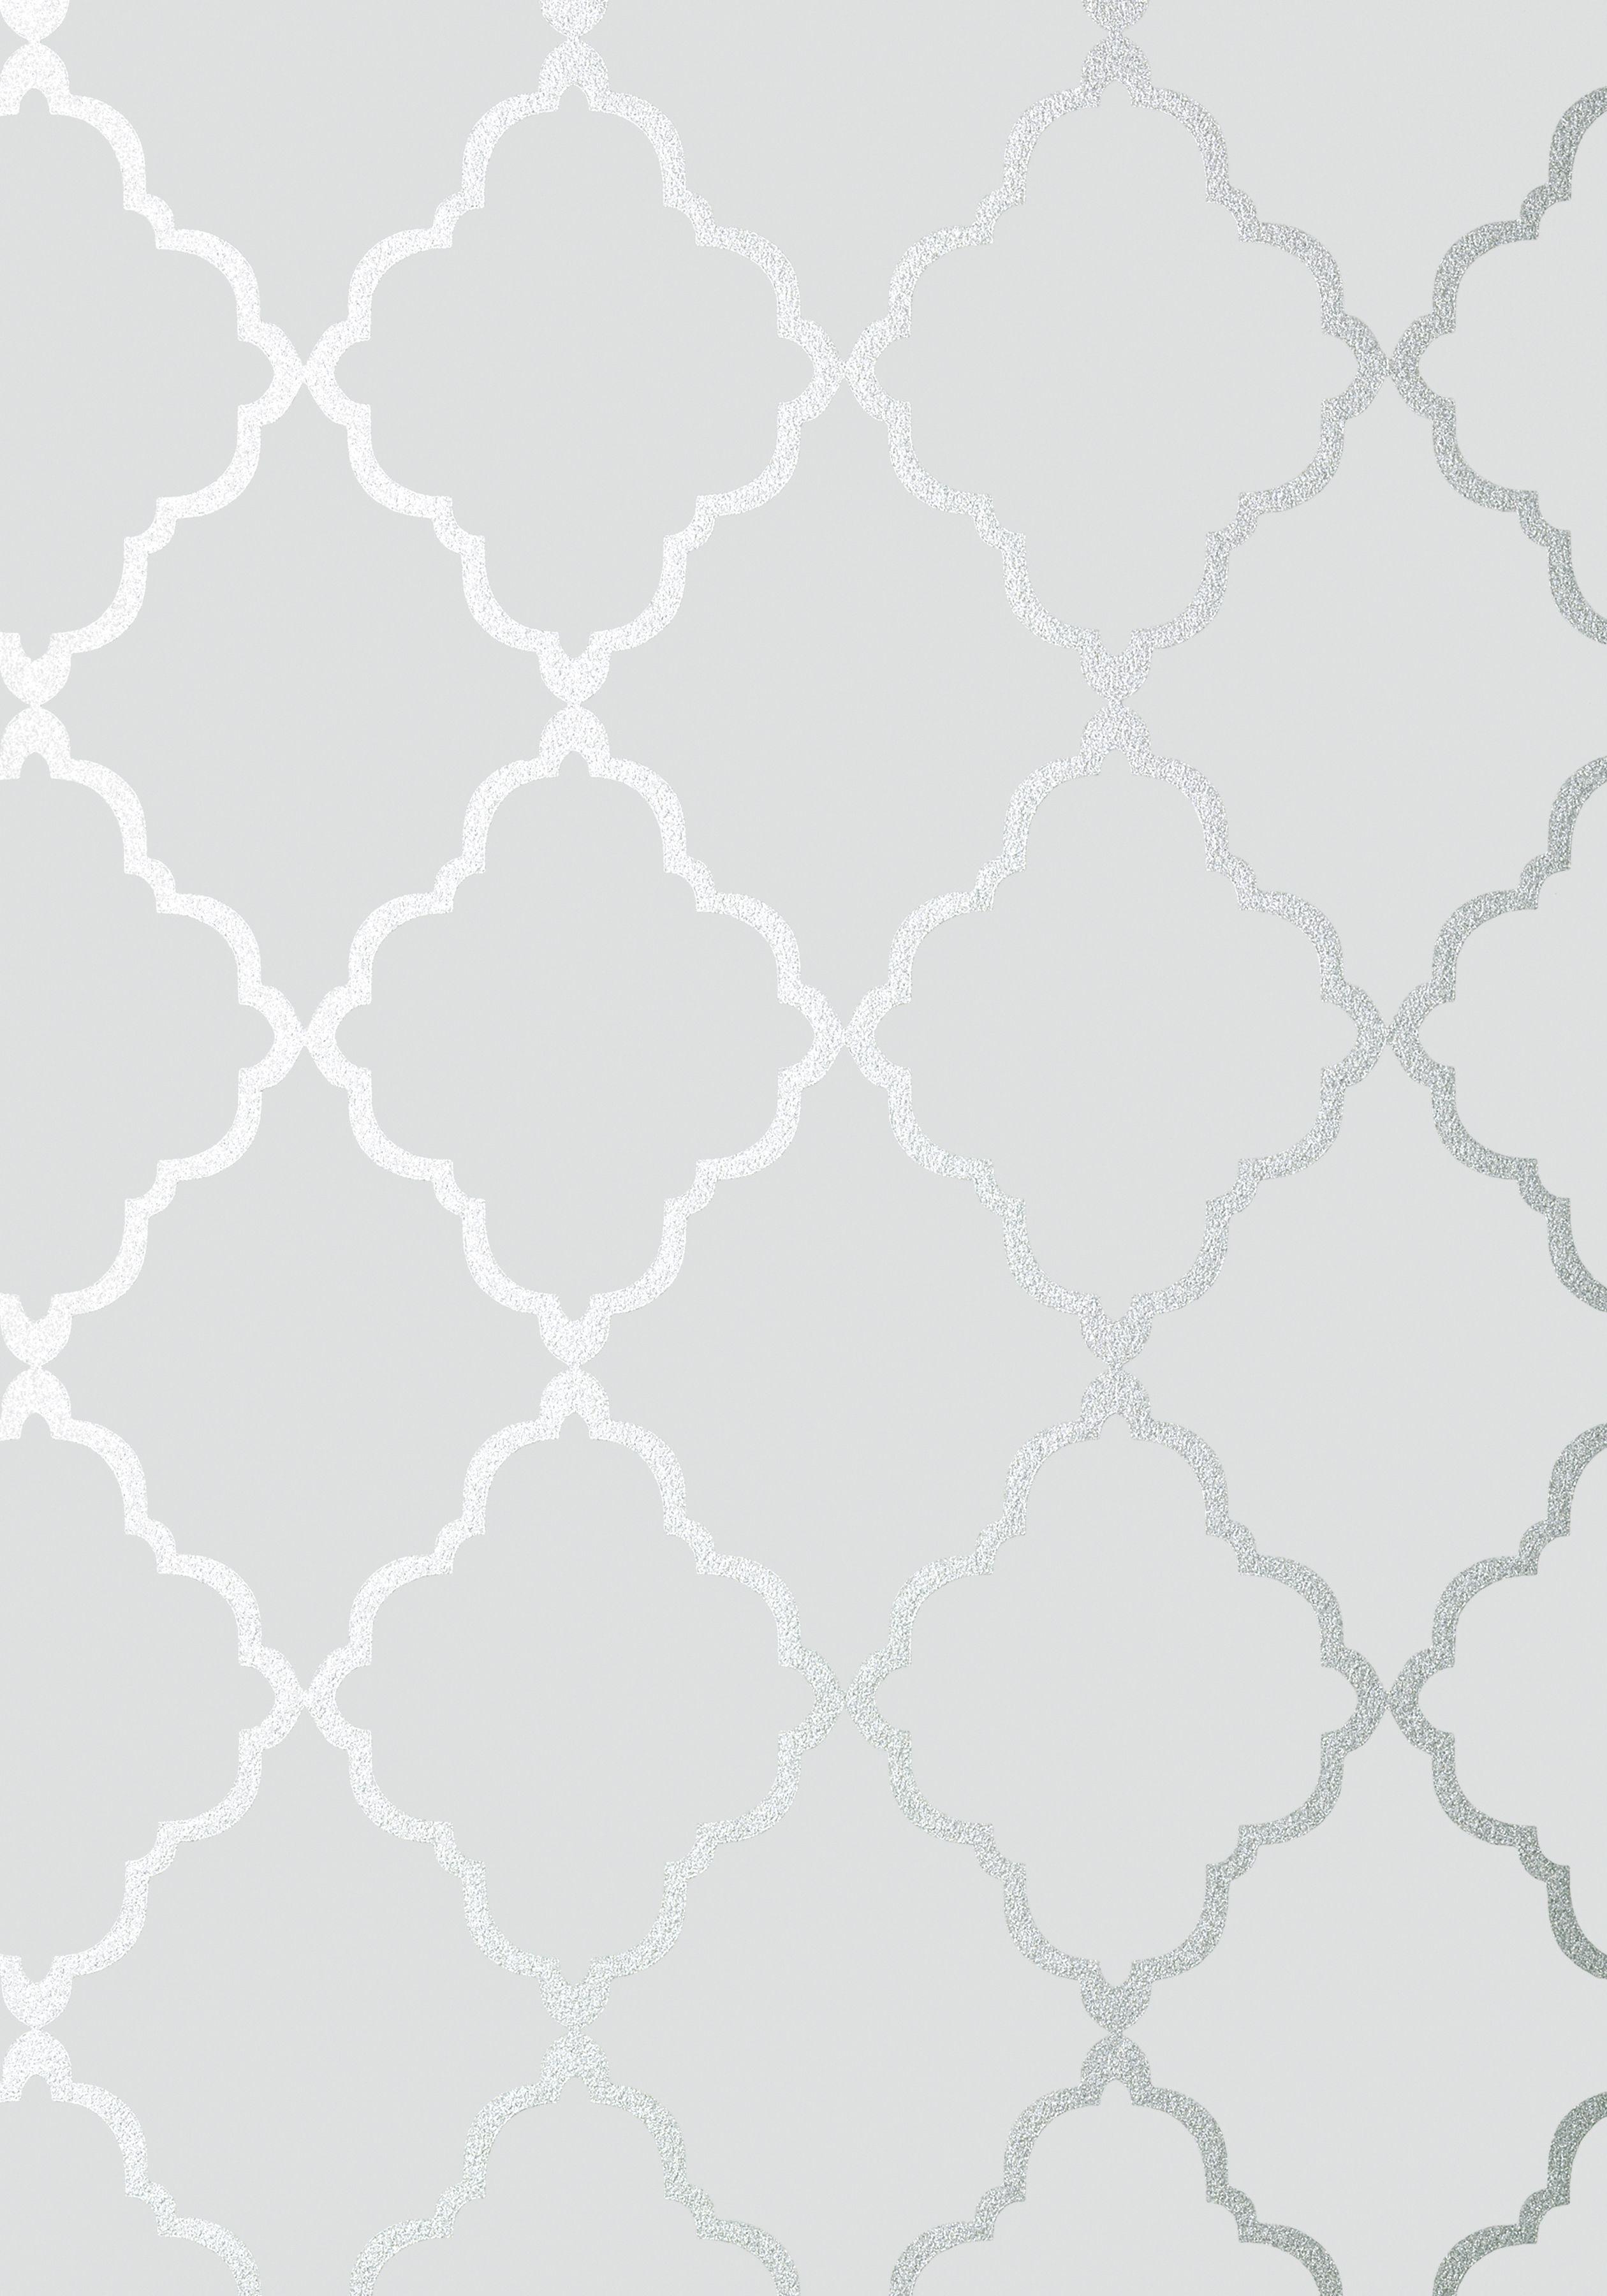 KLEIN TRELLIS, Silver on Grey, AT6057, Collection